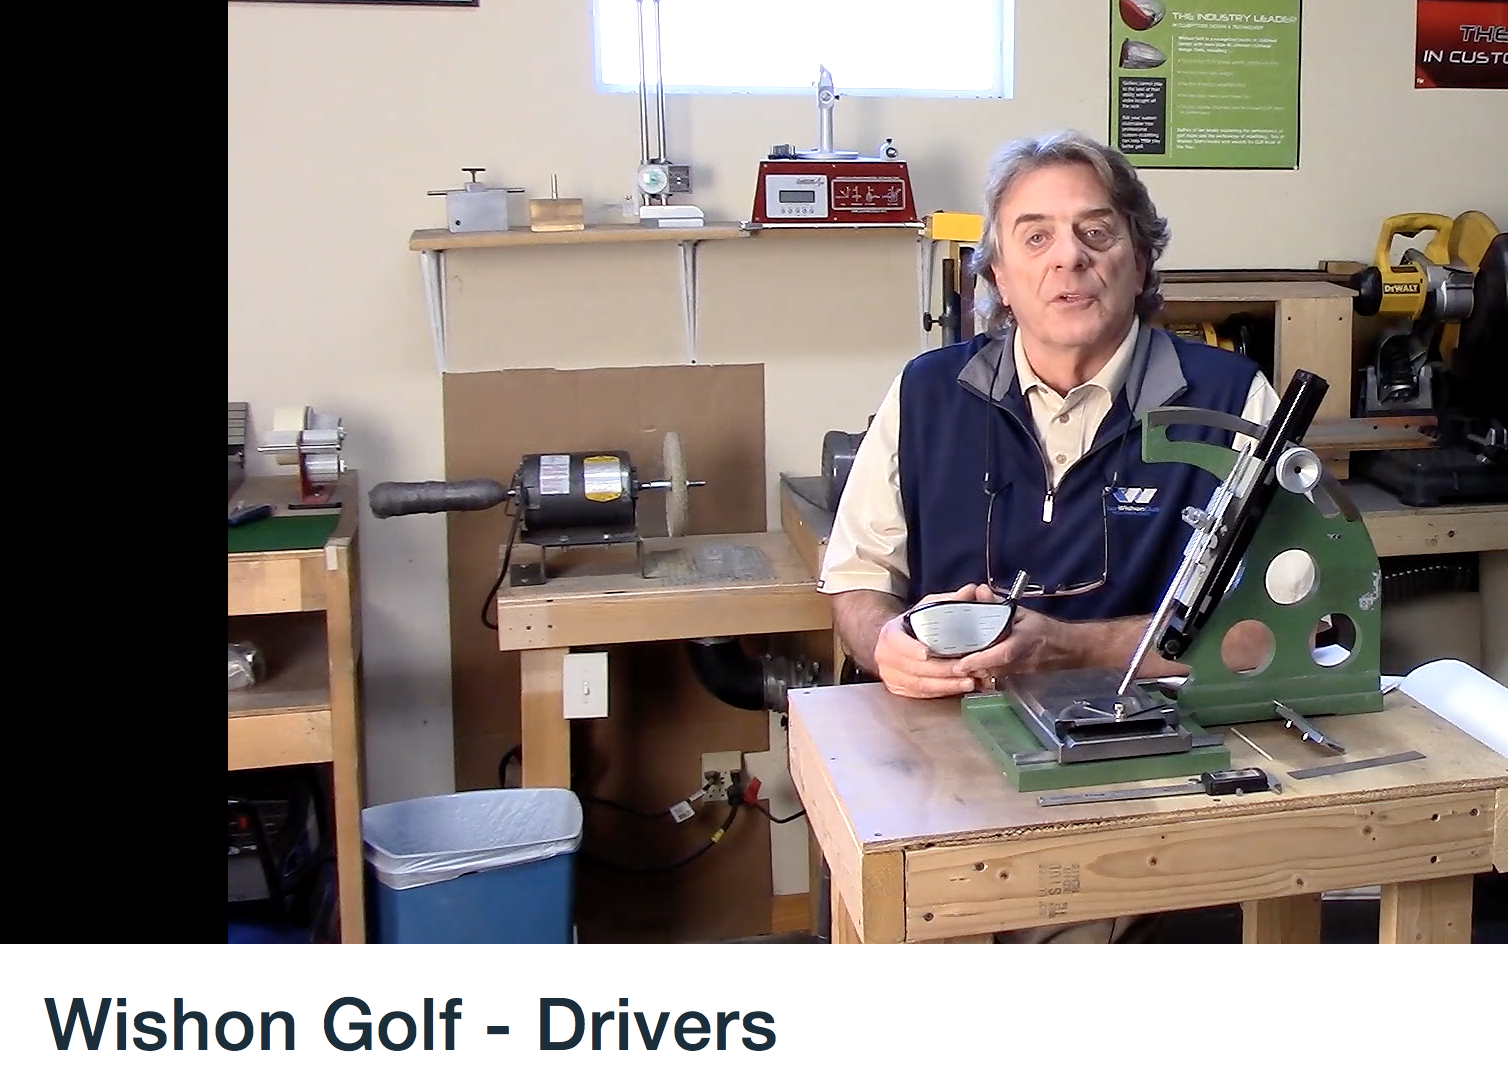 Tom pratar on drivers